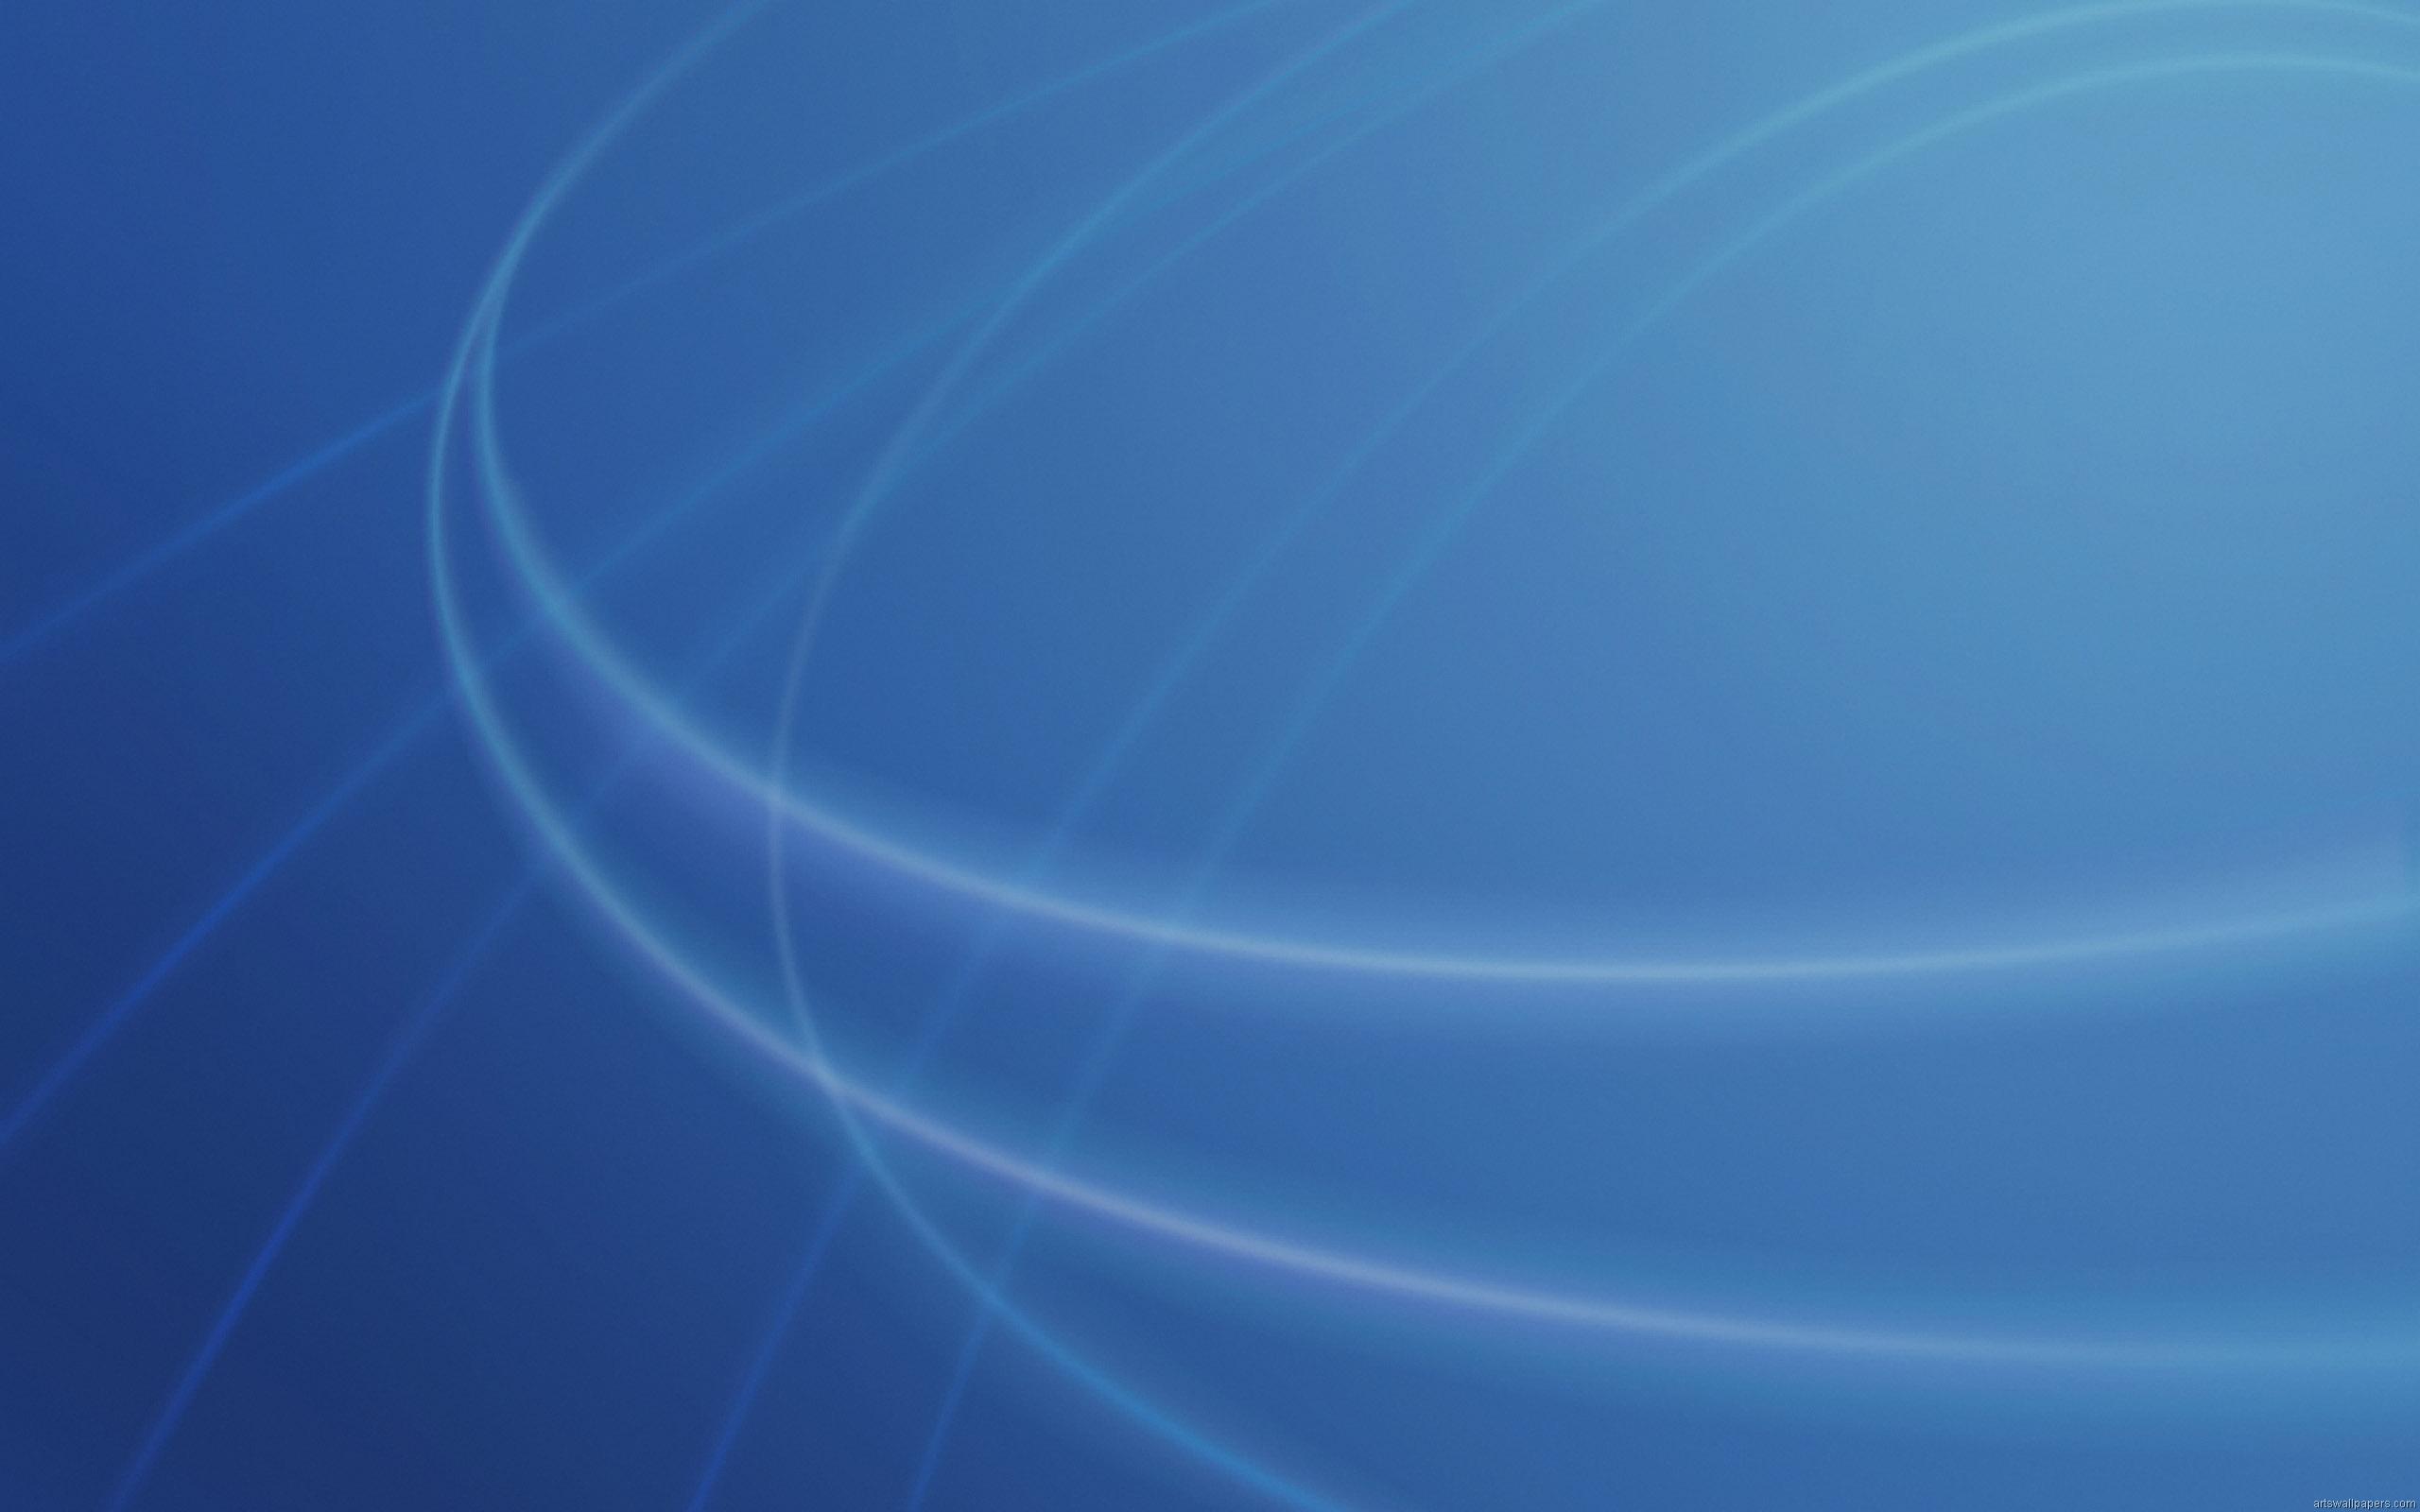 Macbook Air HD Wallpapers 52 Freetopwallpapercom 2560x1600